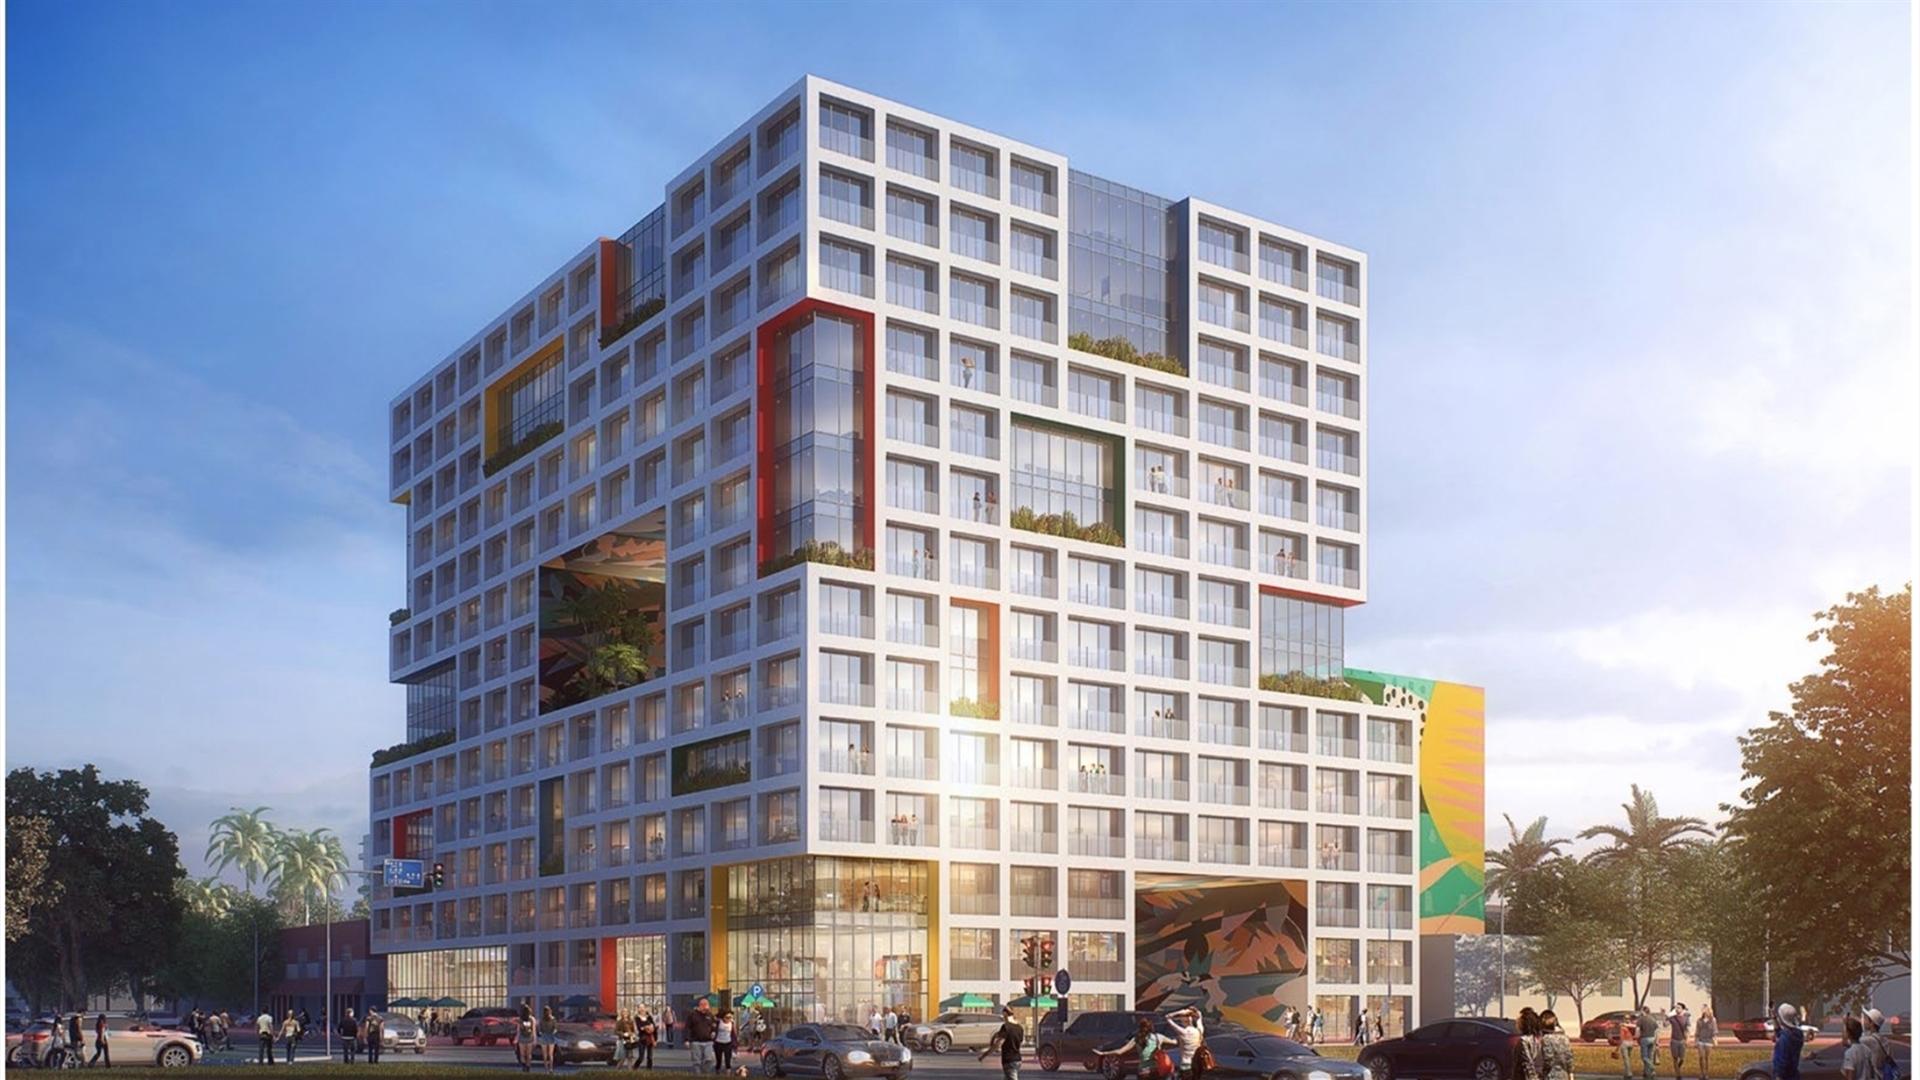 Metro 1 Development Seeks JV Partnership to Co-Develop Mixed